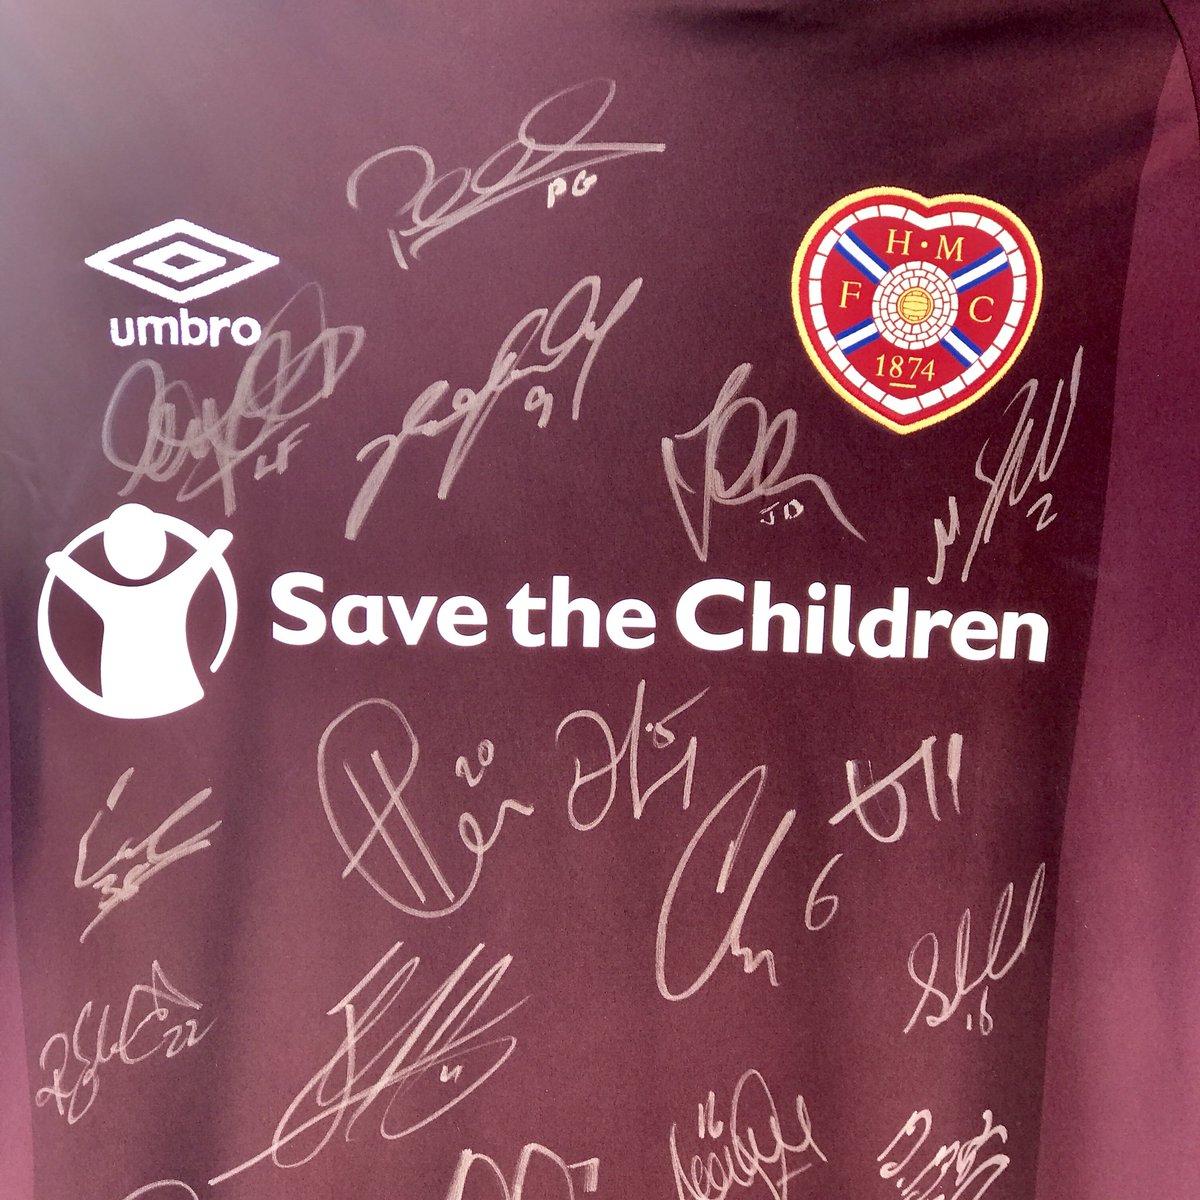 Fancy winning a signed 2018/19 replica top? 🧐  Simply retweet this tweet & follow the Clubstore's new Twitter @HeartsClubstore 👍